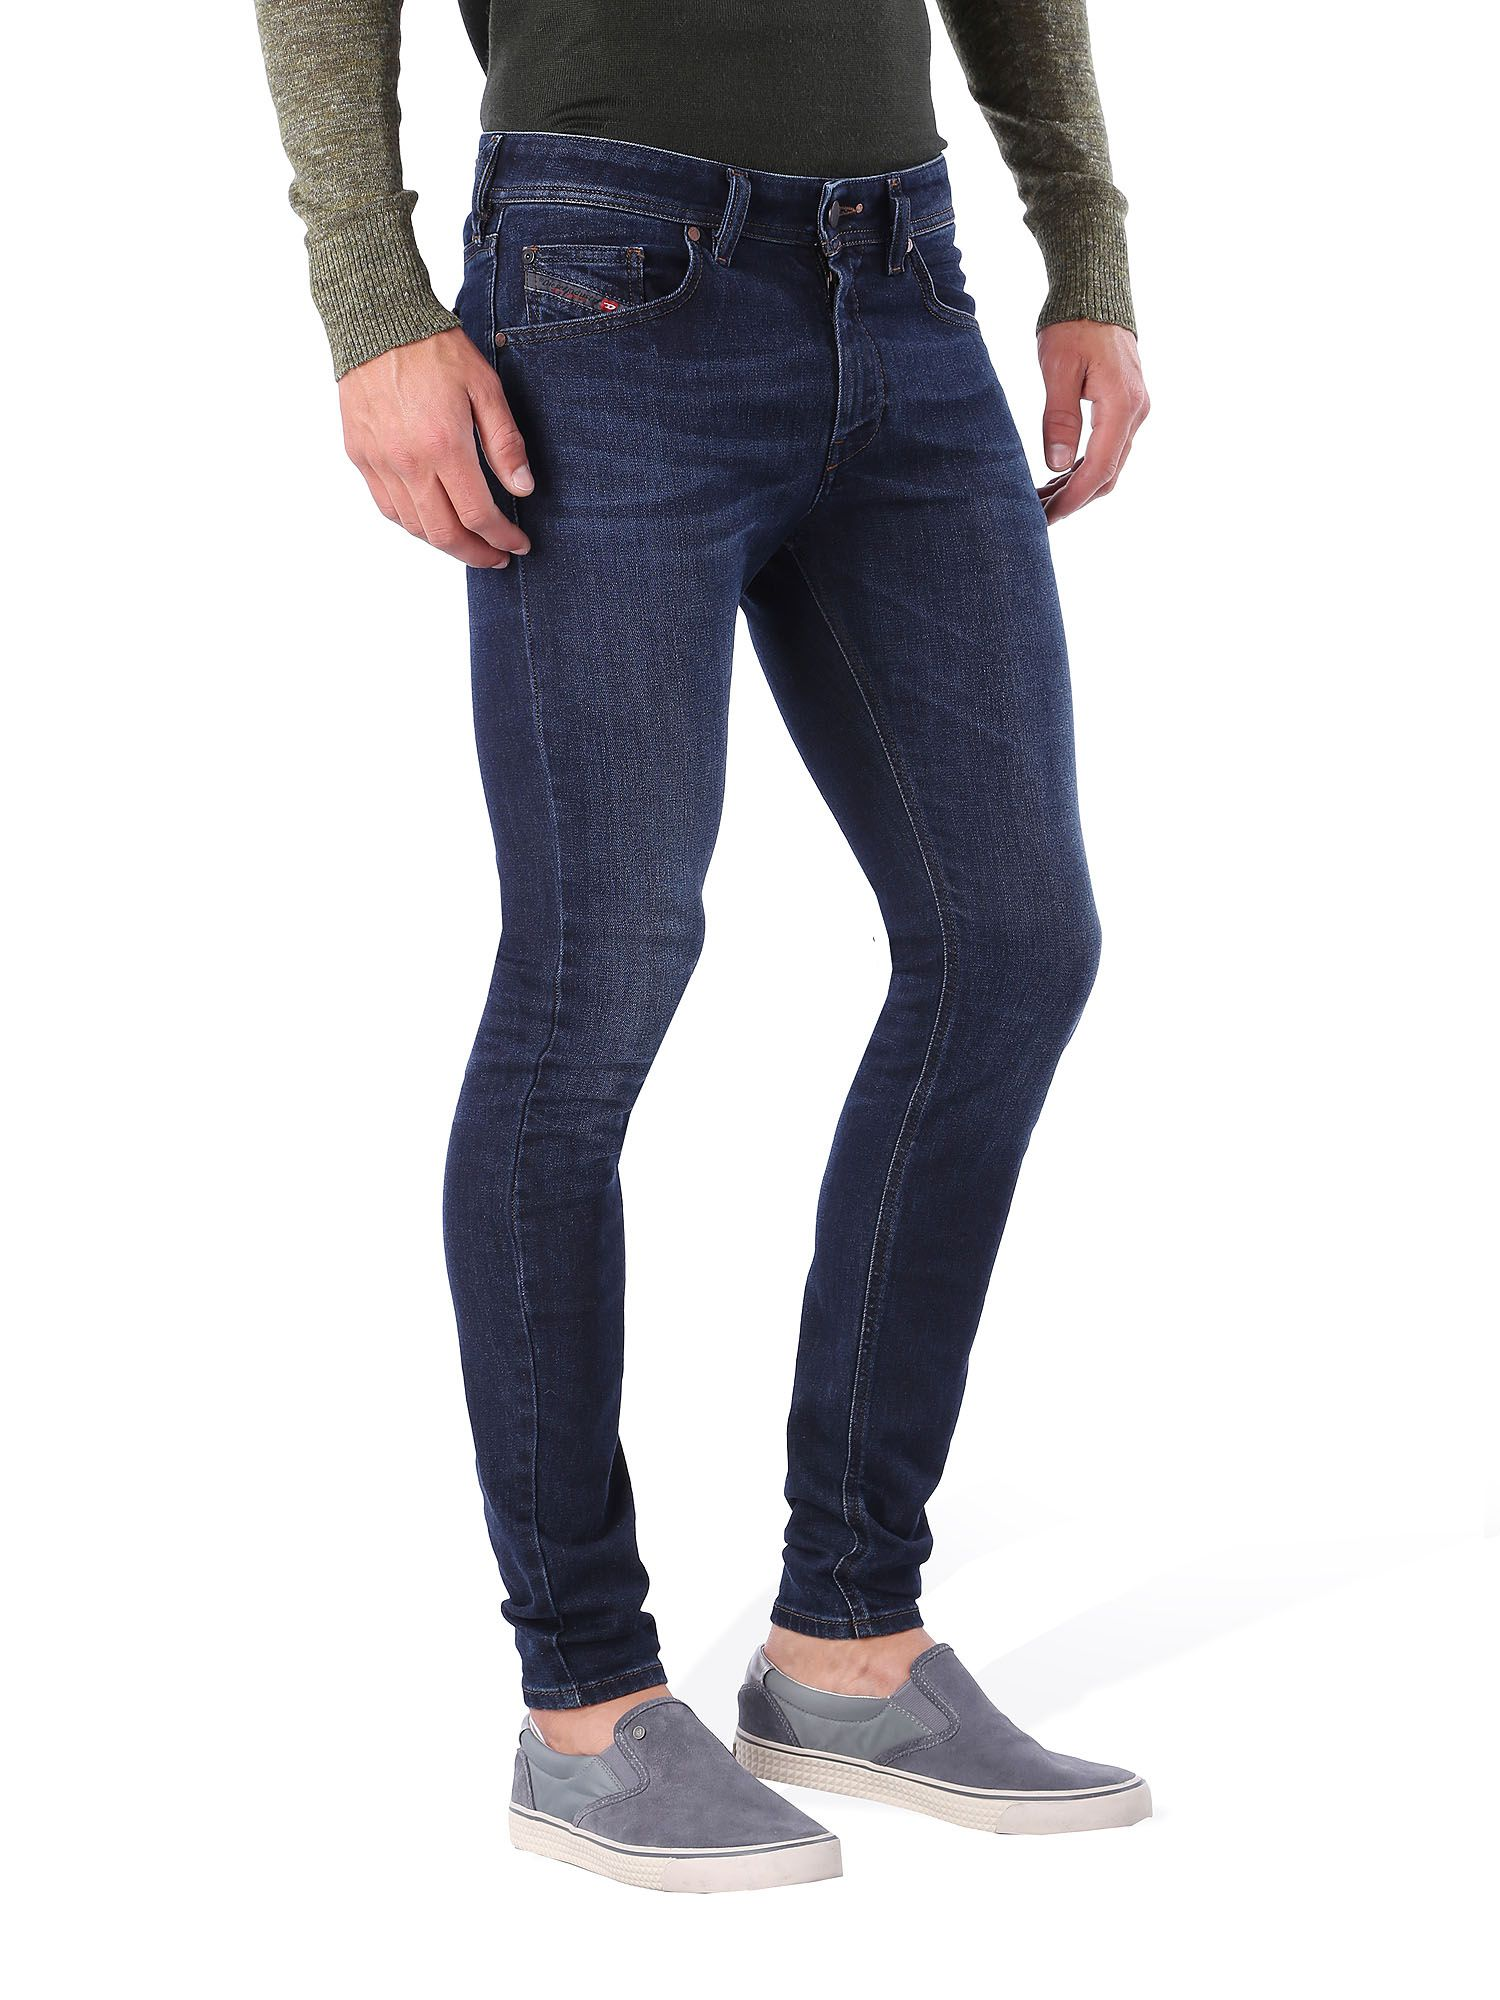 mens skinny jeans tight jeans for men wi7zmzky tzimetw